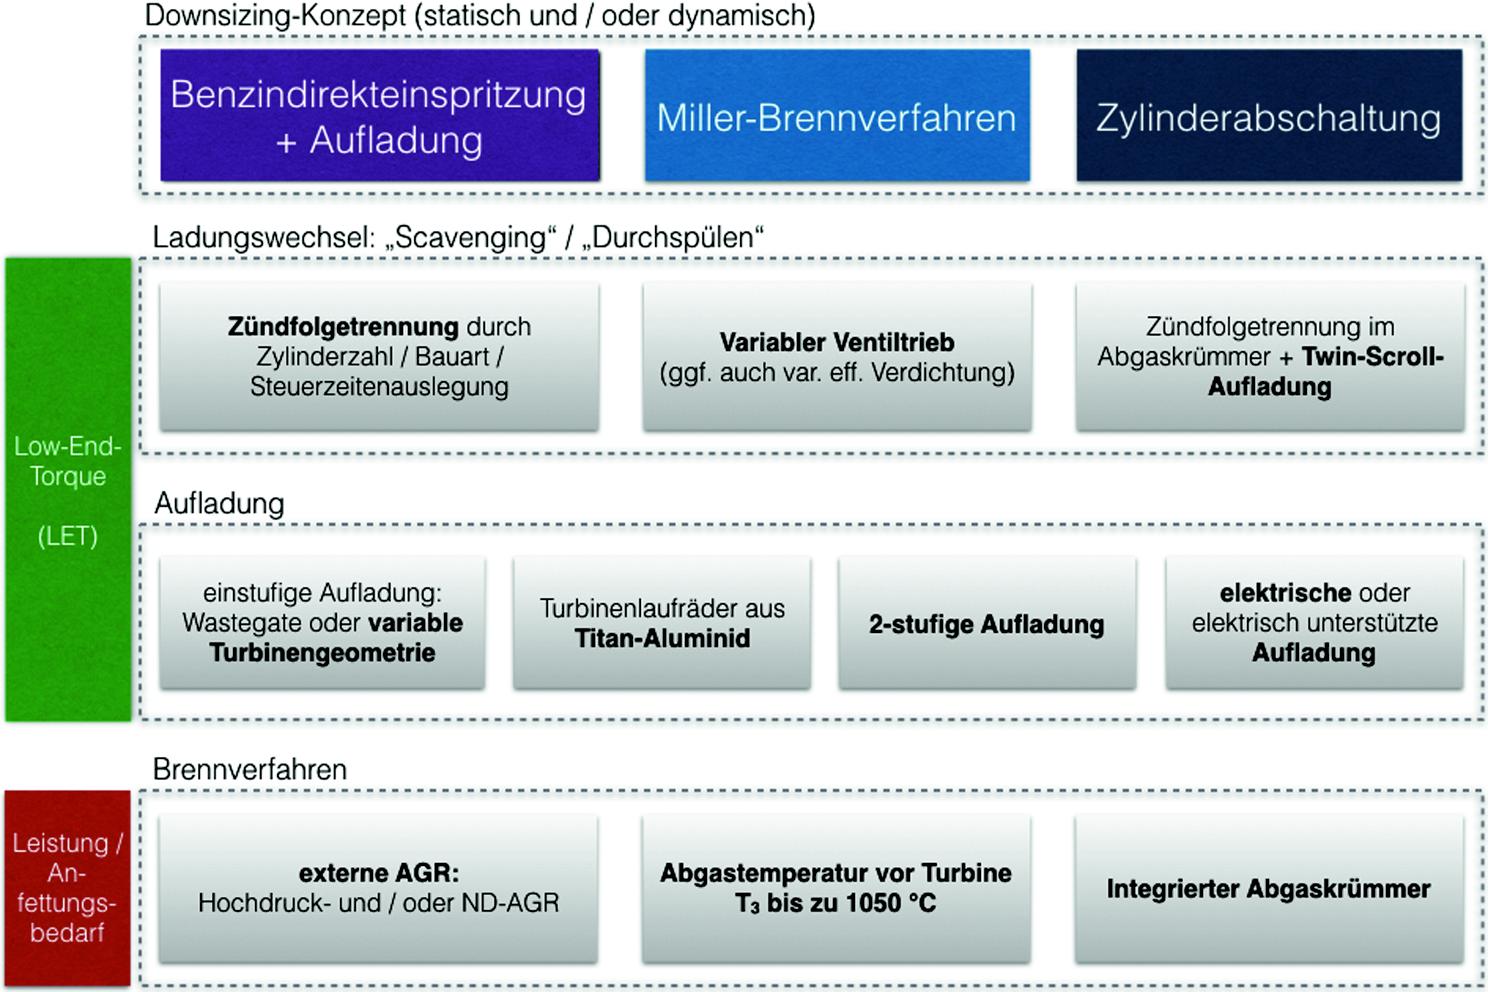 Downsizing bei PKW-Motoren | SpringerLink